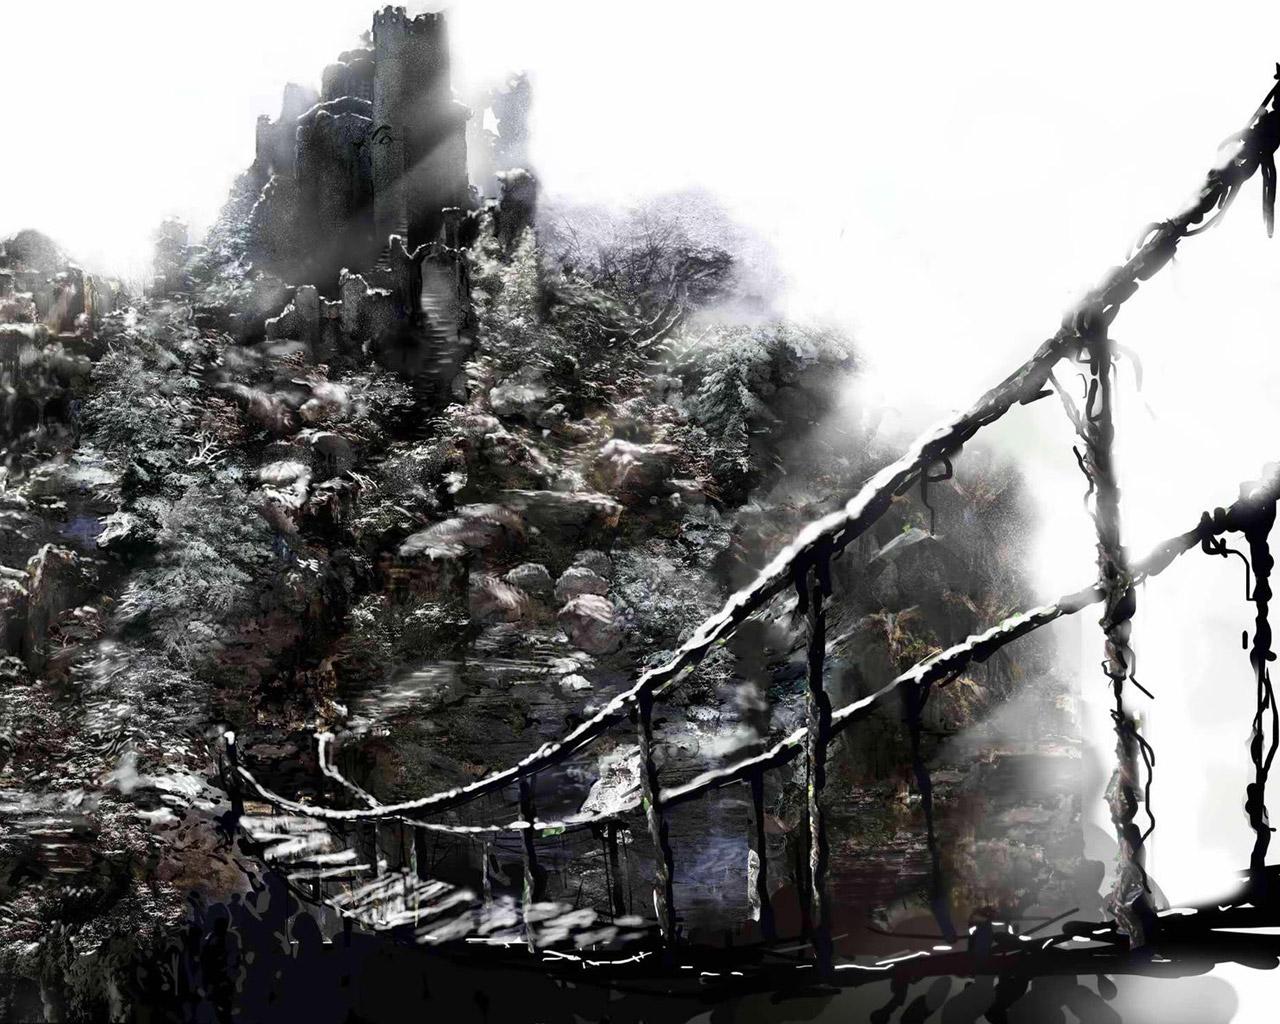 Dark Souls Wallpaper in 1280x1024